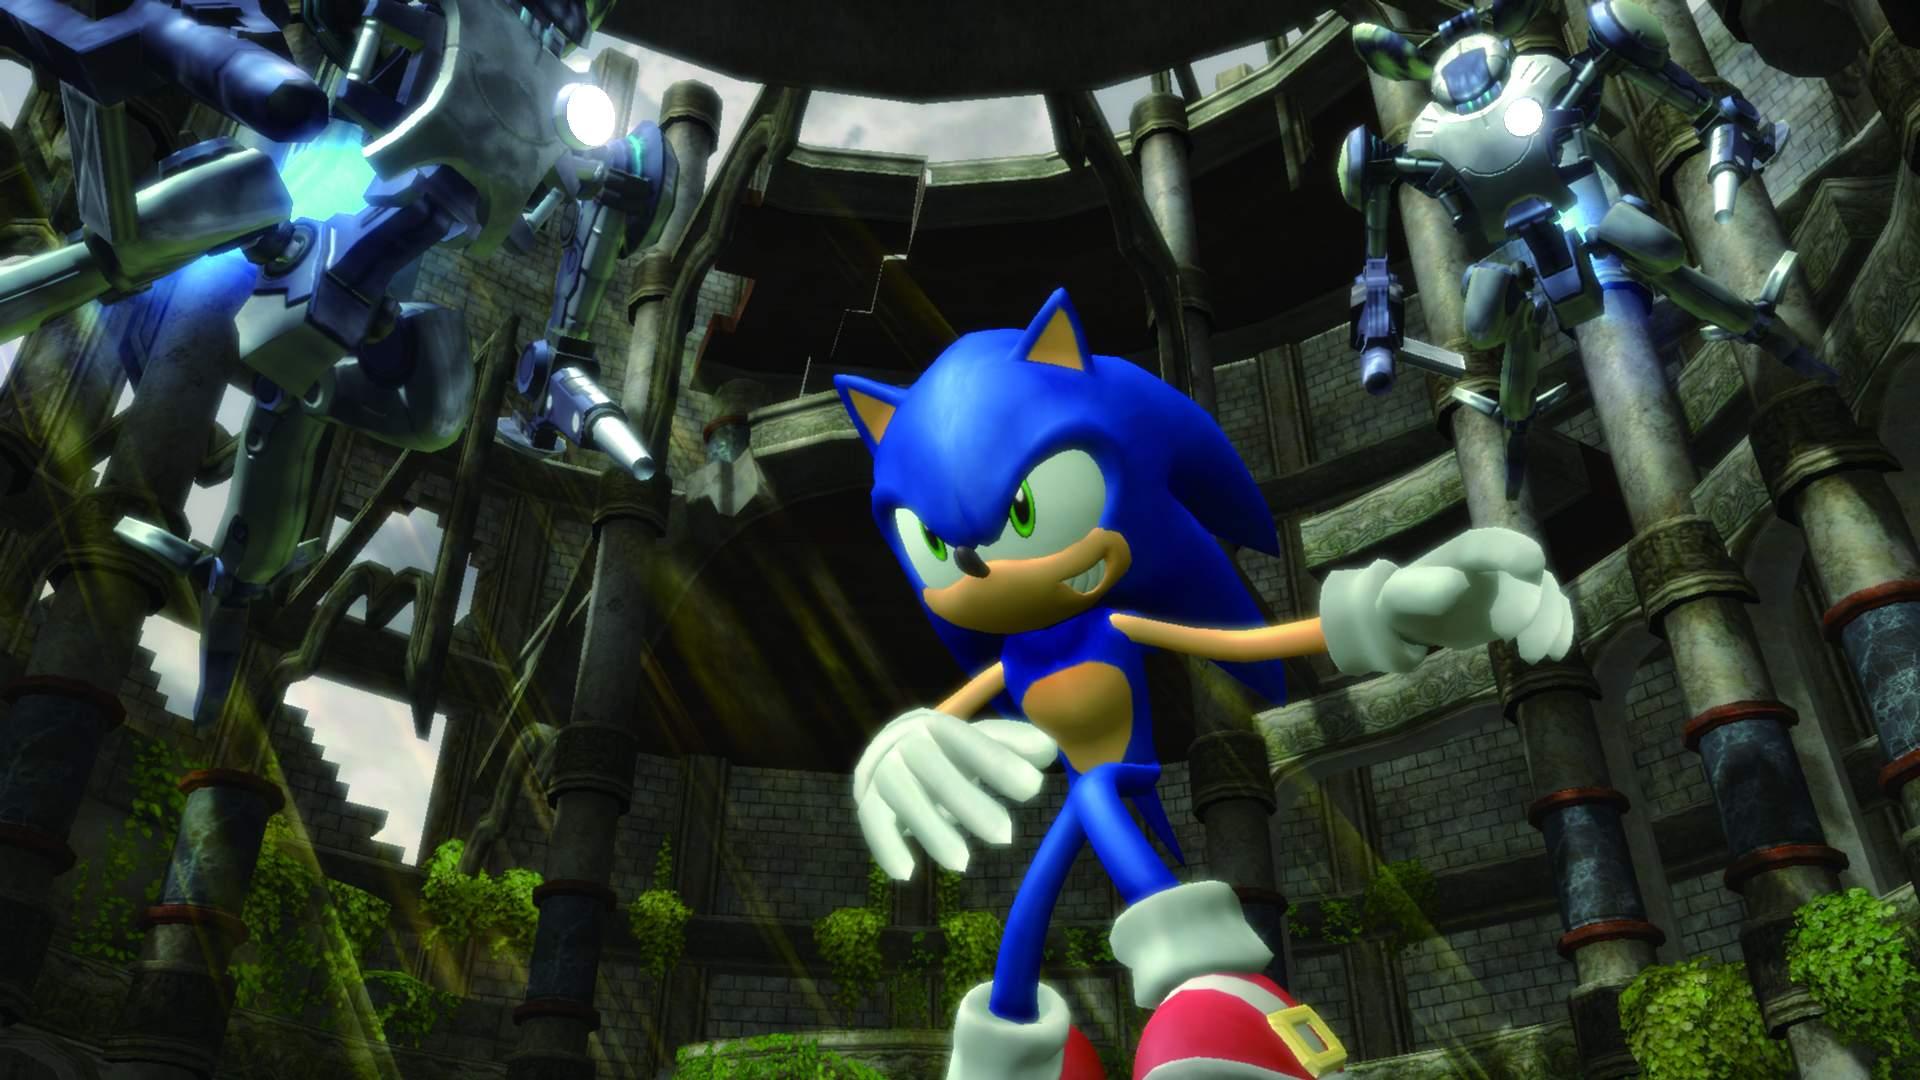 File:Sonic06screen8.jpg